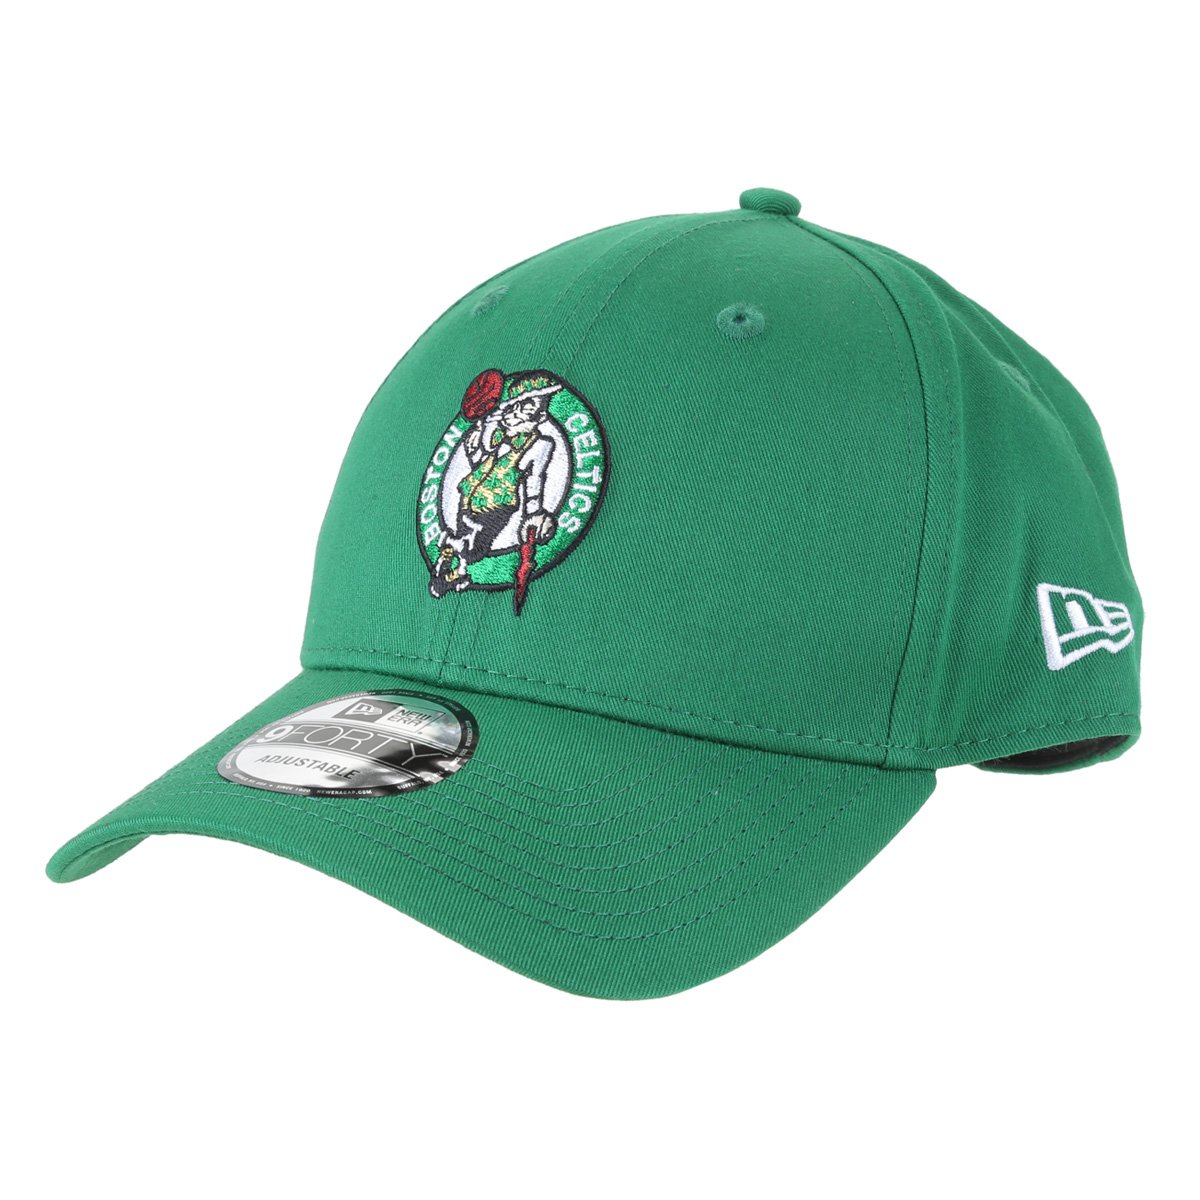 Boné New Era NBA Boston Celtics Aba Curva Snapback 940